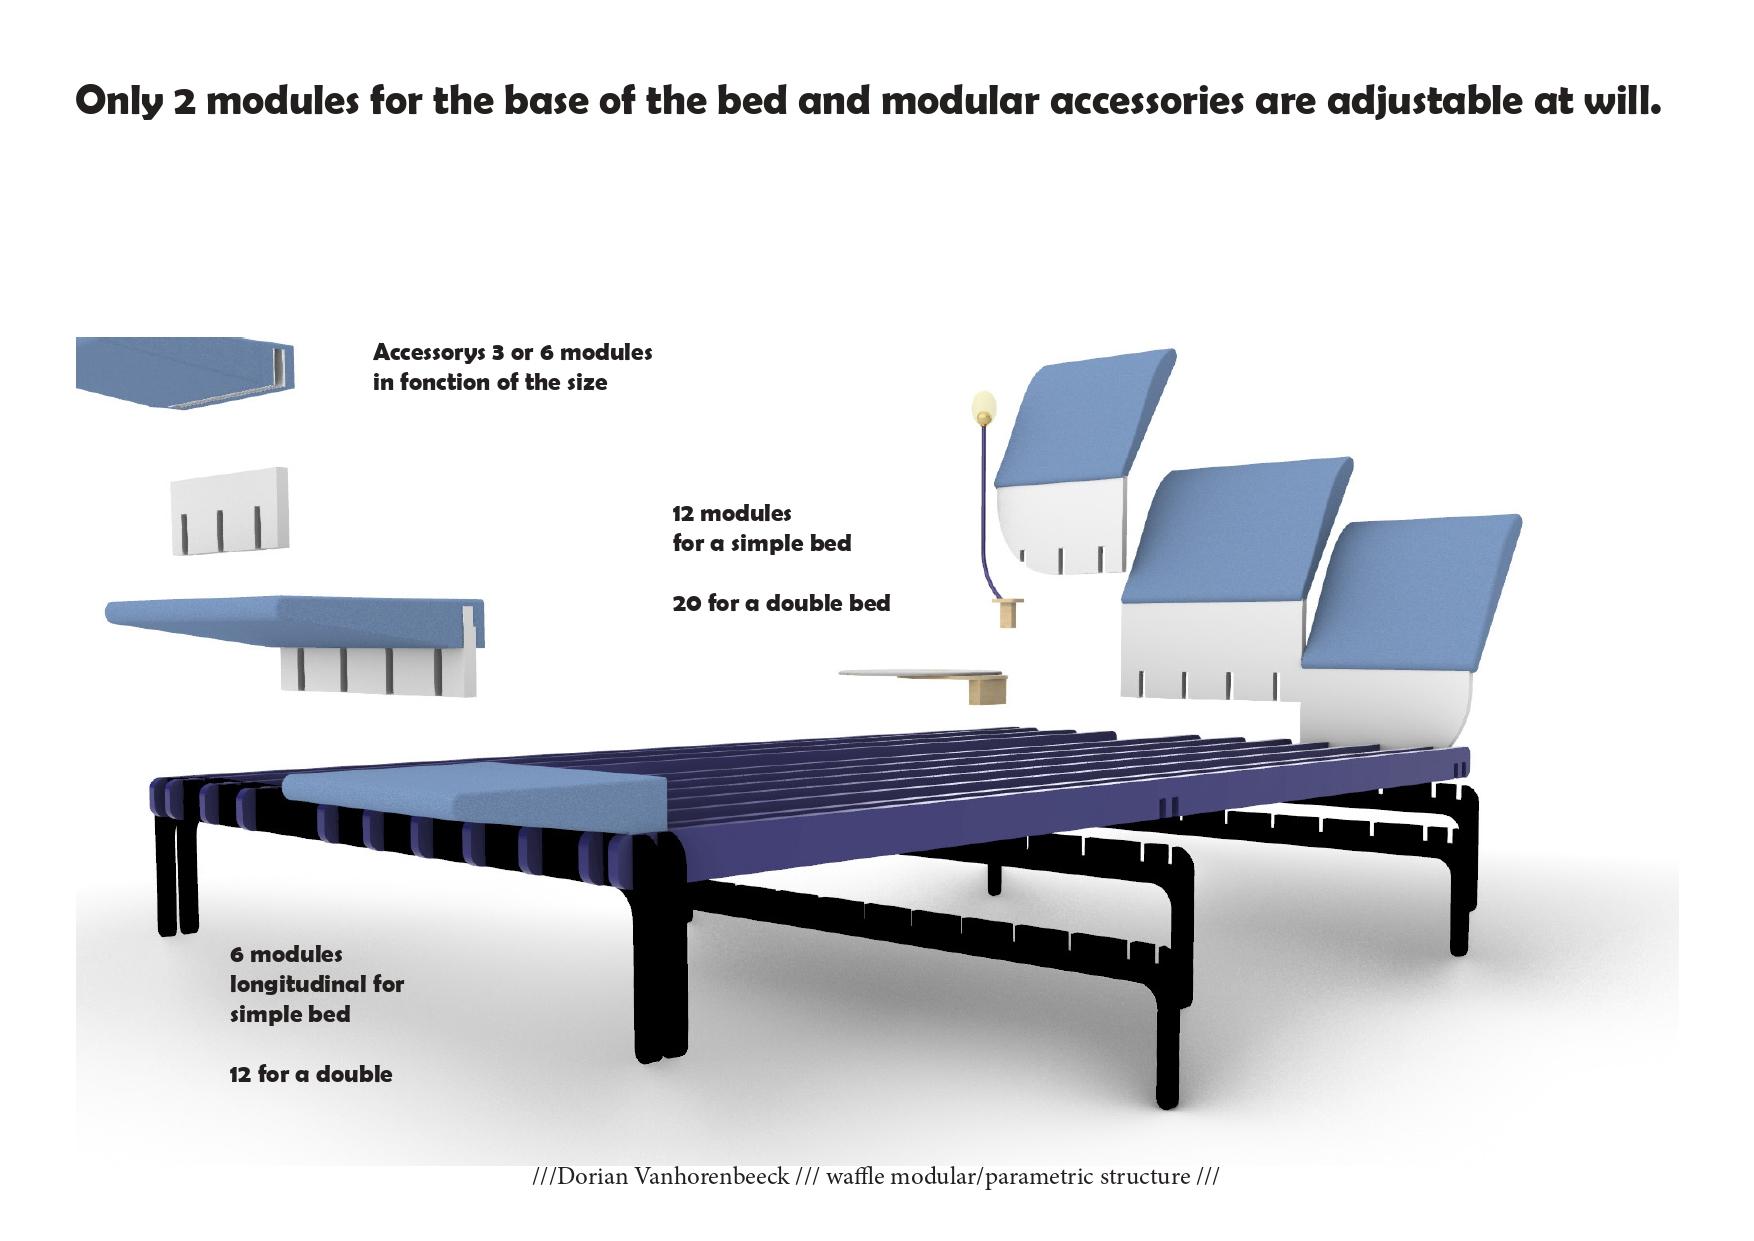 Livret Waffle modular-parametric Structure Dorian Vanhorenbeeck_page-0004